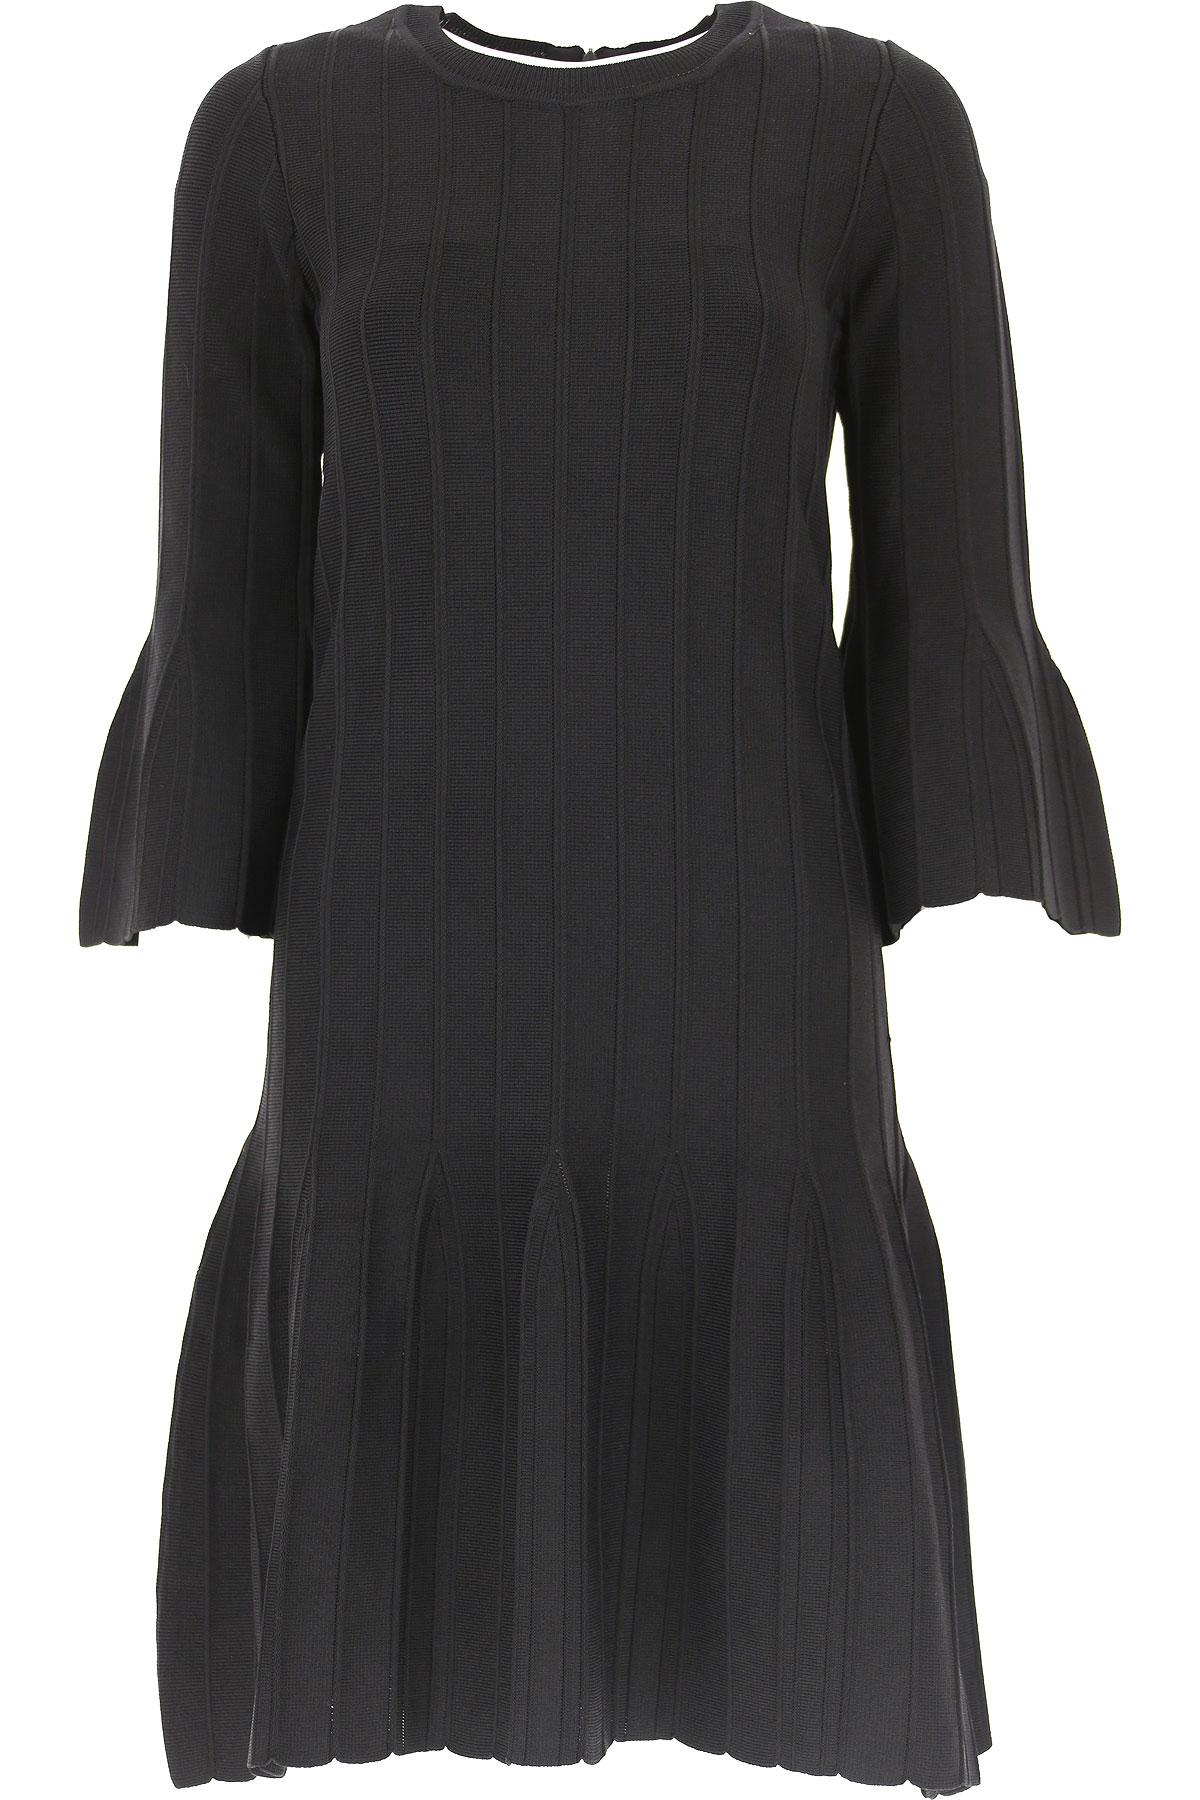 Michael Kors Dress for Women, Evening Cocktail Party, Black, Viscose, 2019, 10 12 8